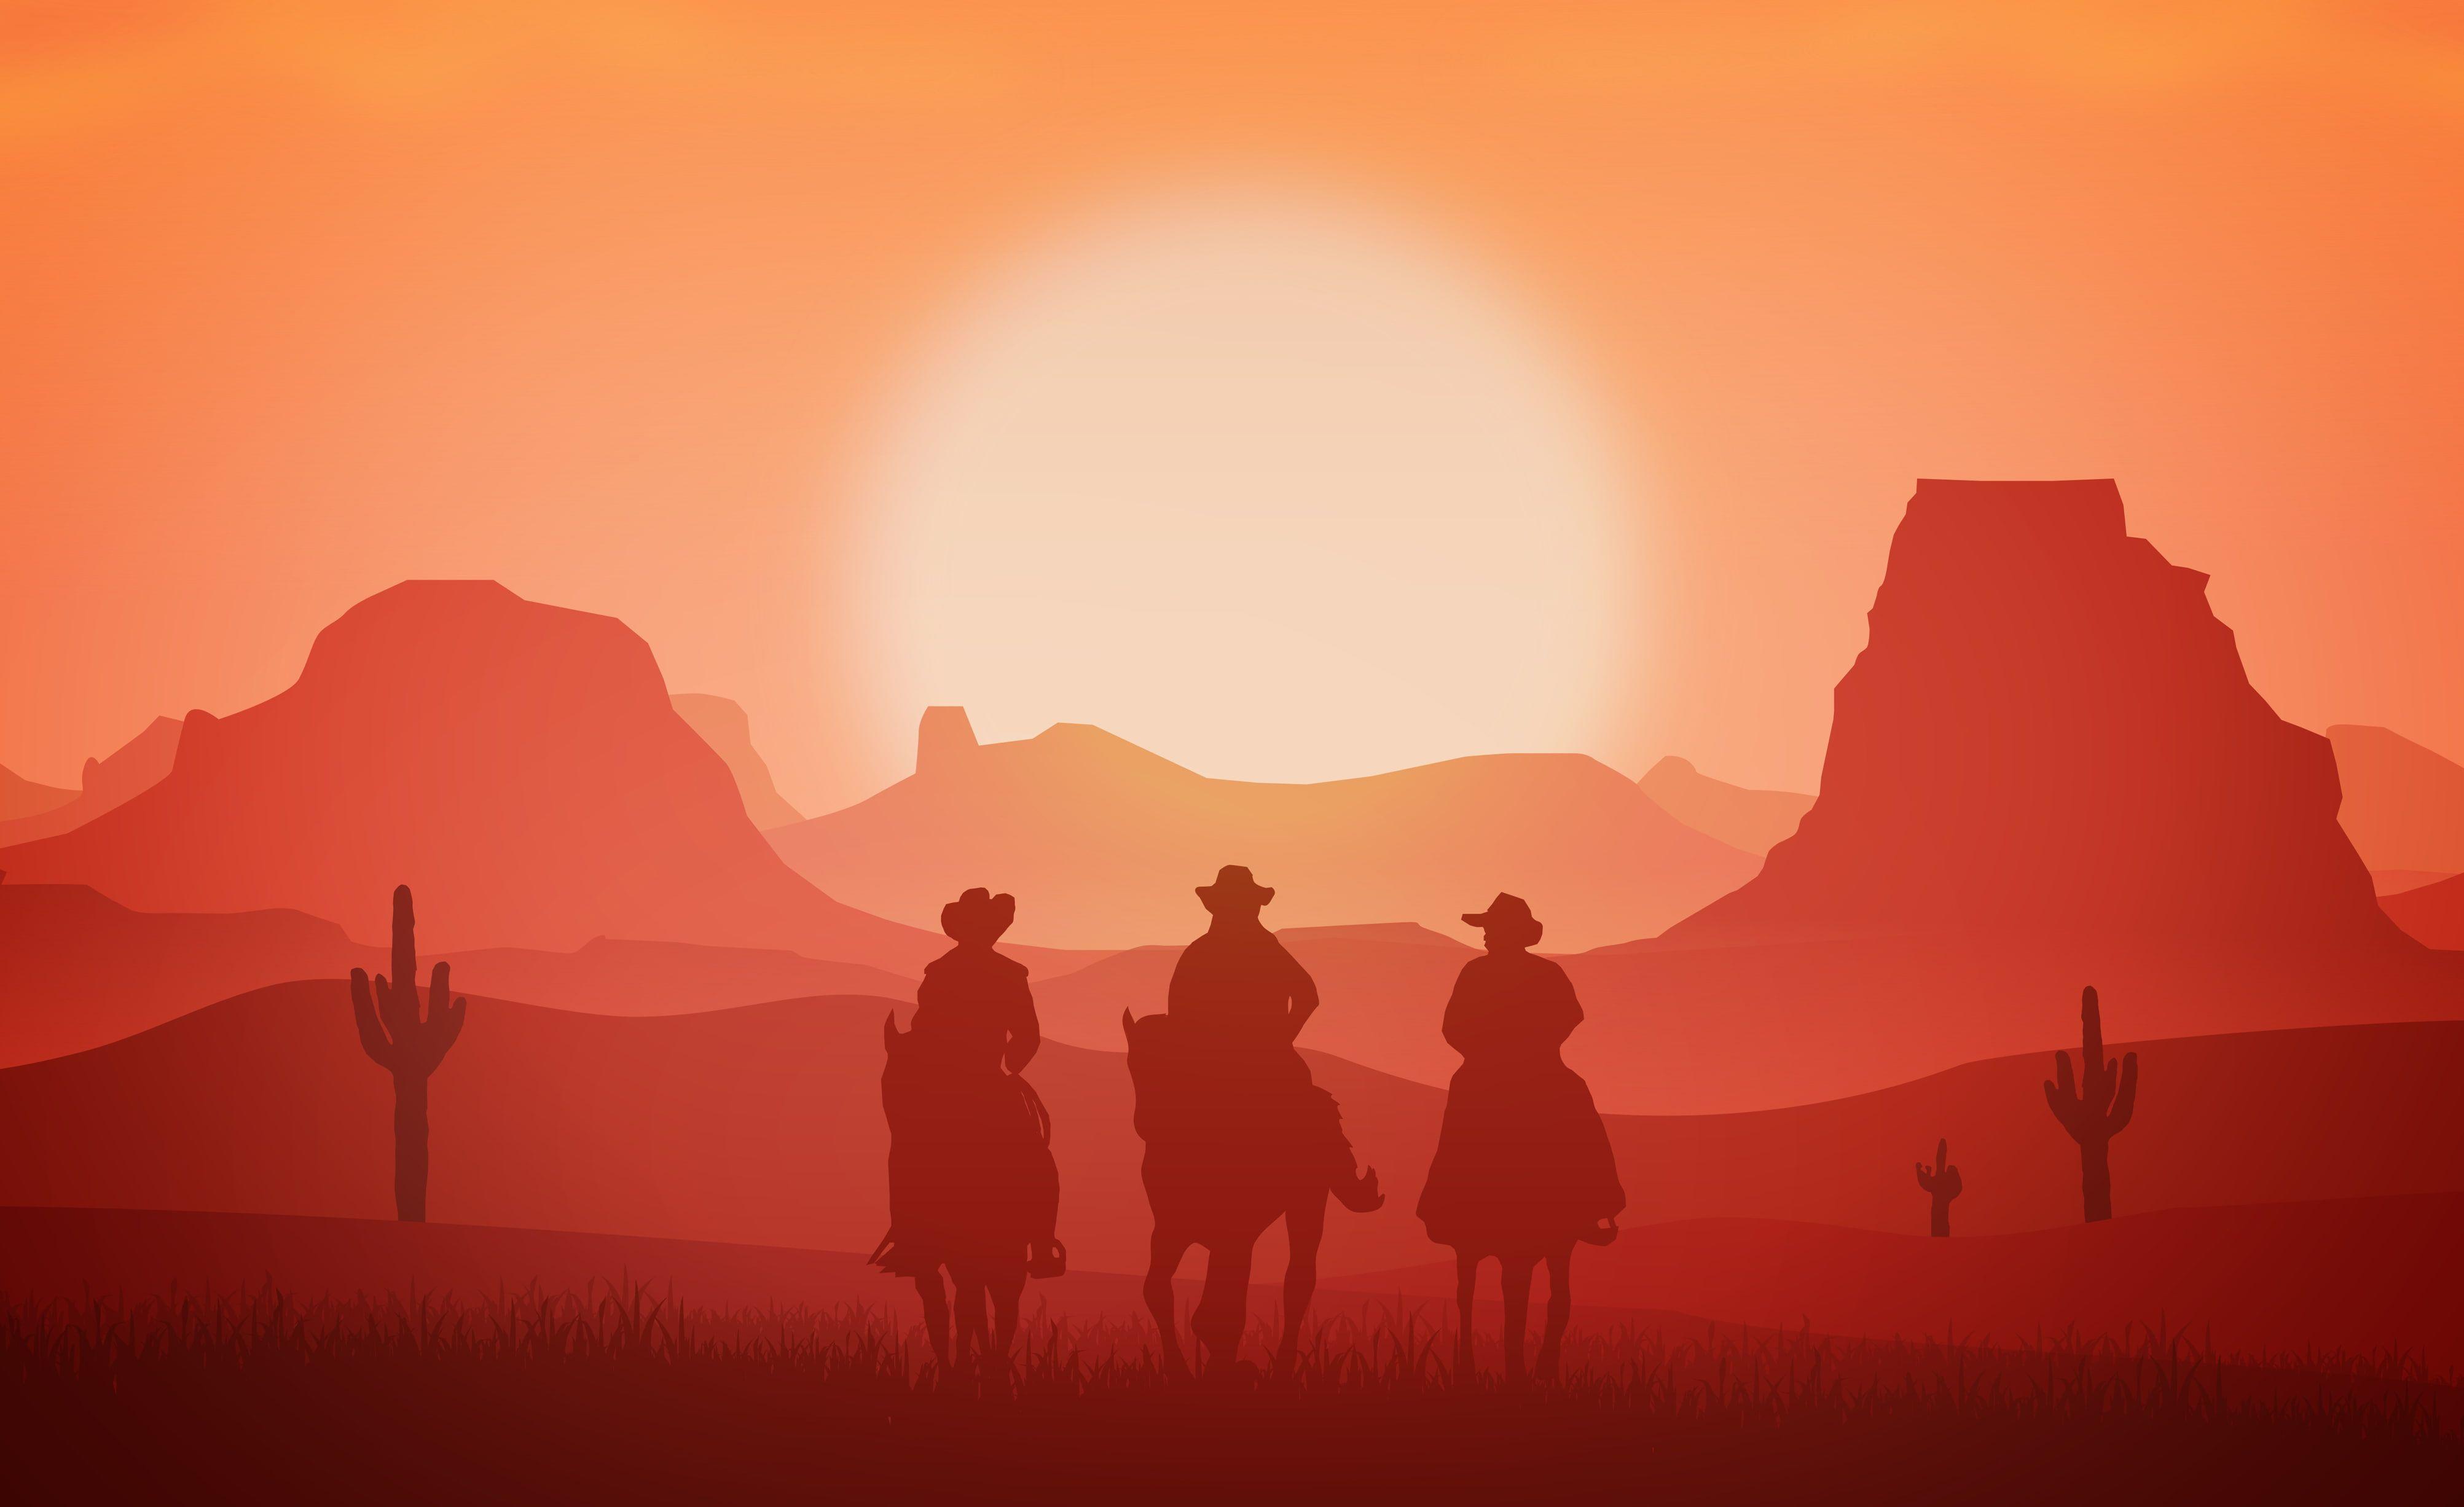 Wild West Cowboys Horses Sunset Western 4k 4k Wallpaper Hdwallpaper Desktop West Art Wild West Hd Wallpaper